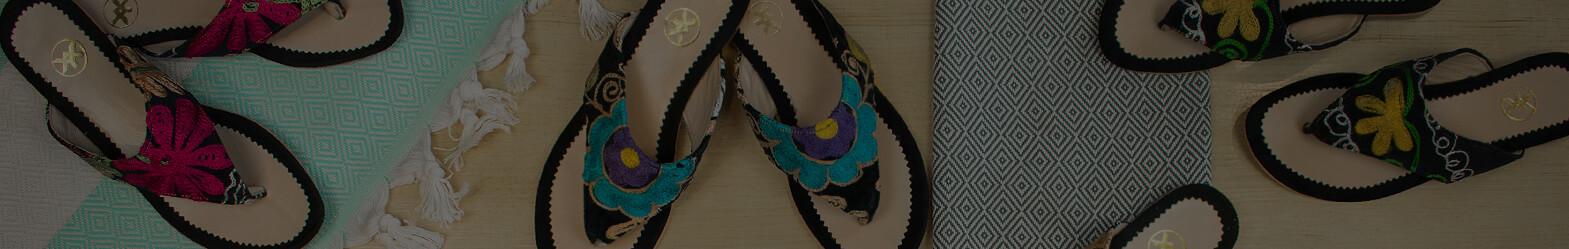 Suzani Sandals